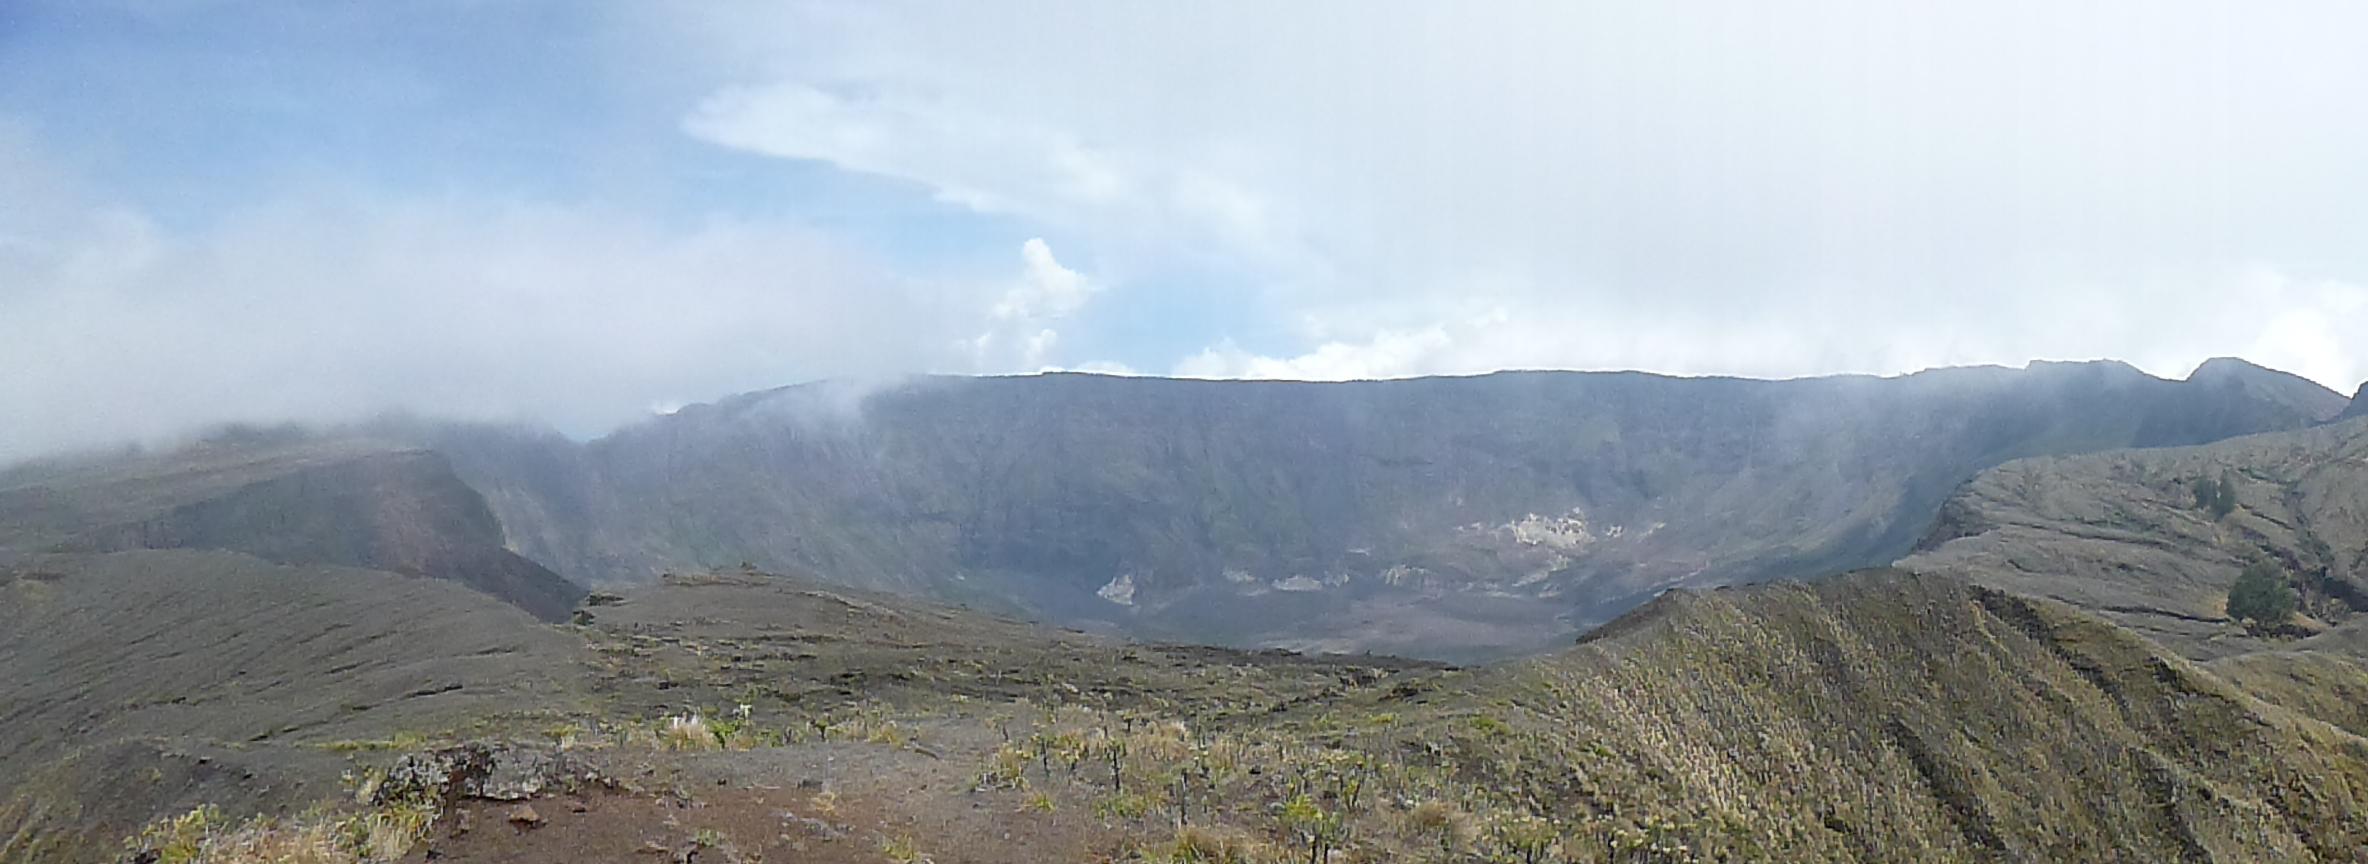 Kaldera di lihat dari puncak Gunung Tambora.